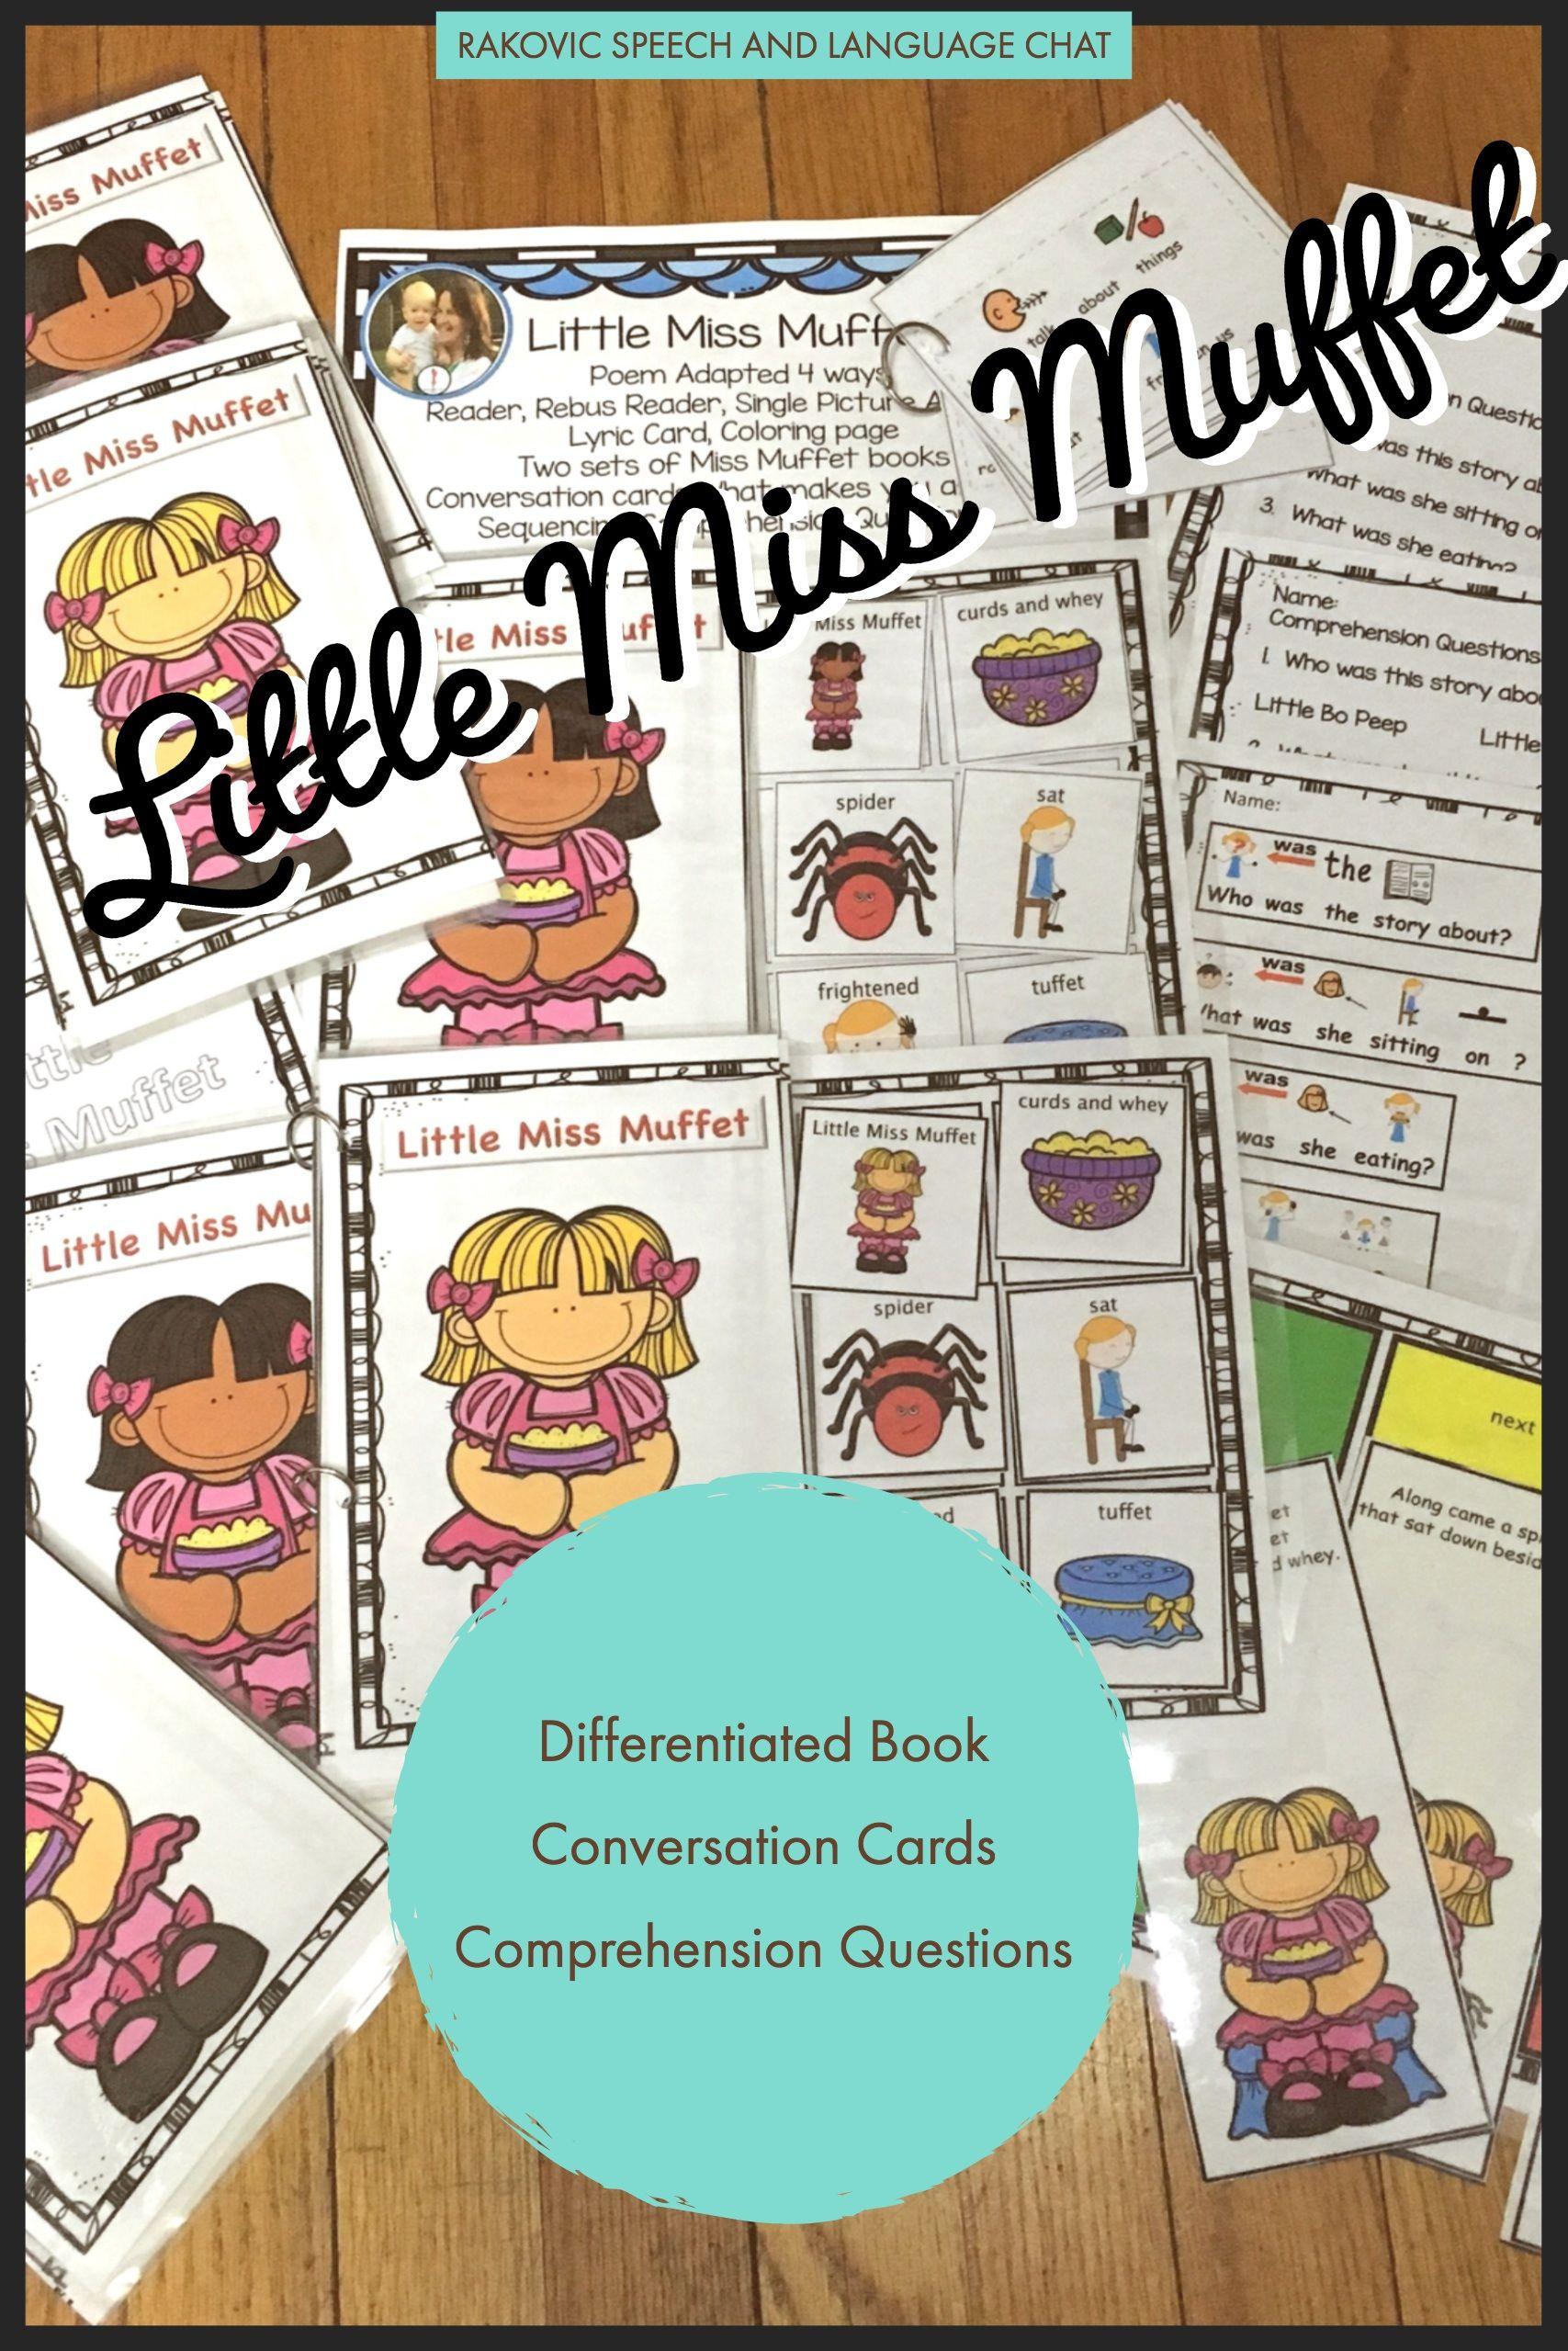 Little Miss Muffet Nursery Rhyme Interactive Sequence